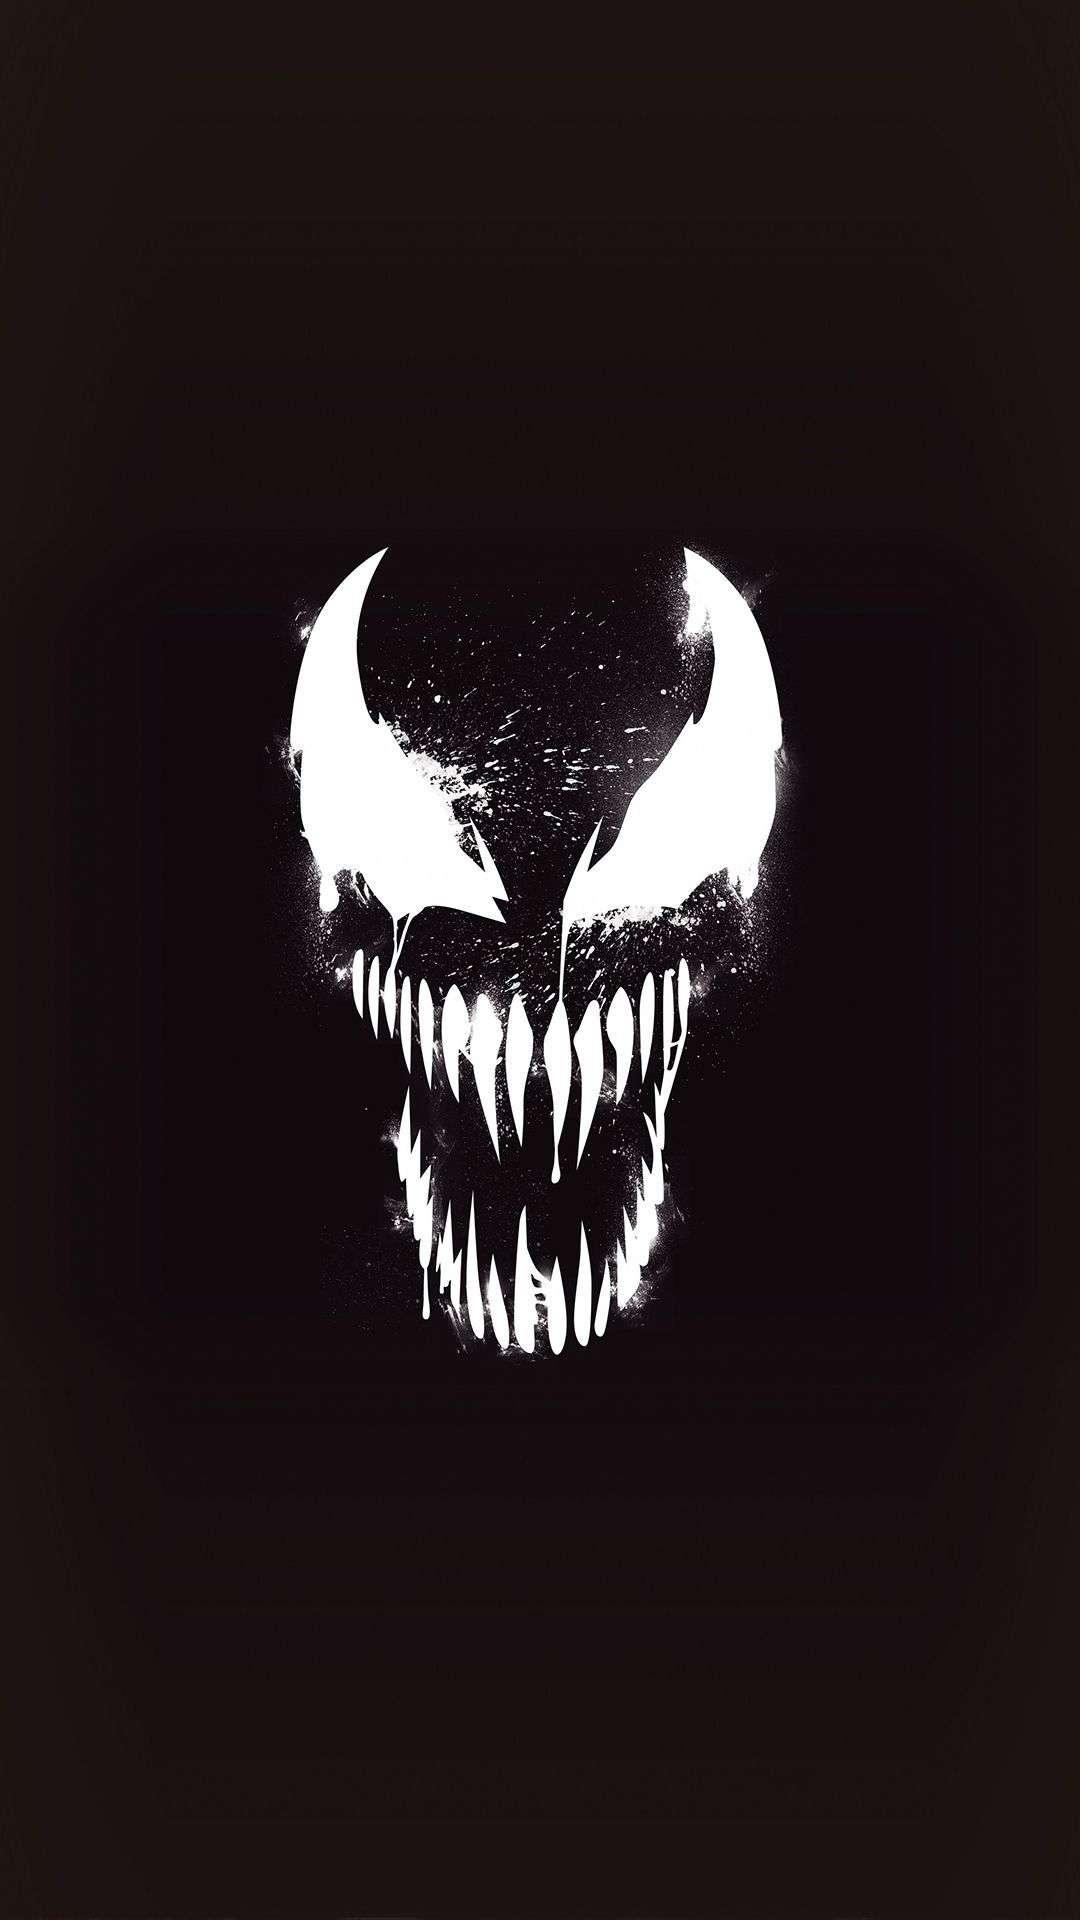 Venom Wallpaper Hd Android 1080x1920